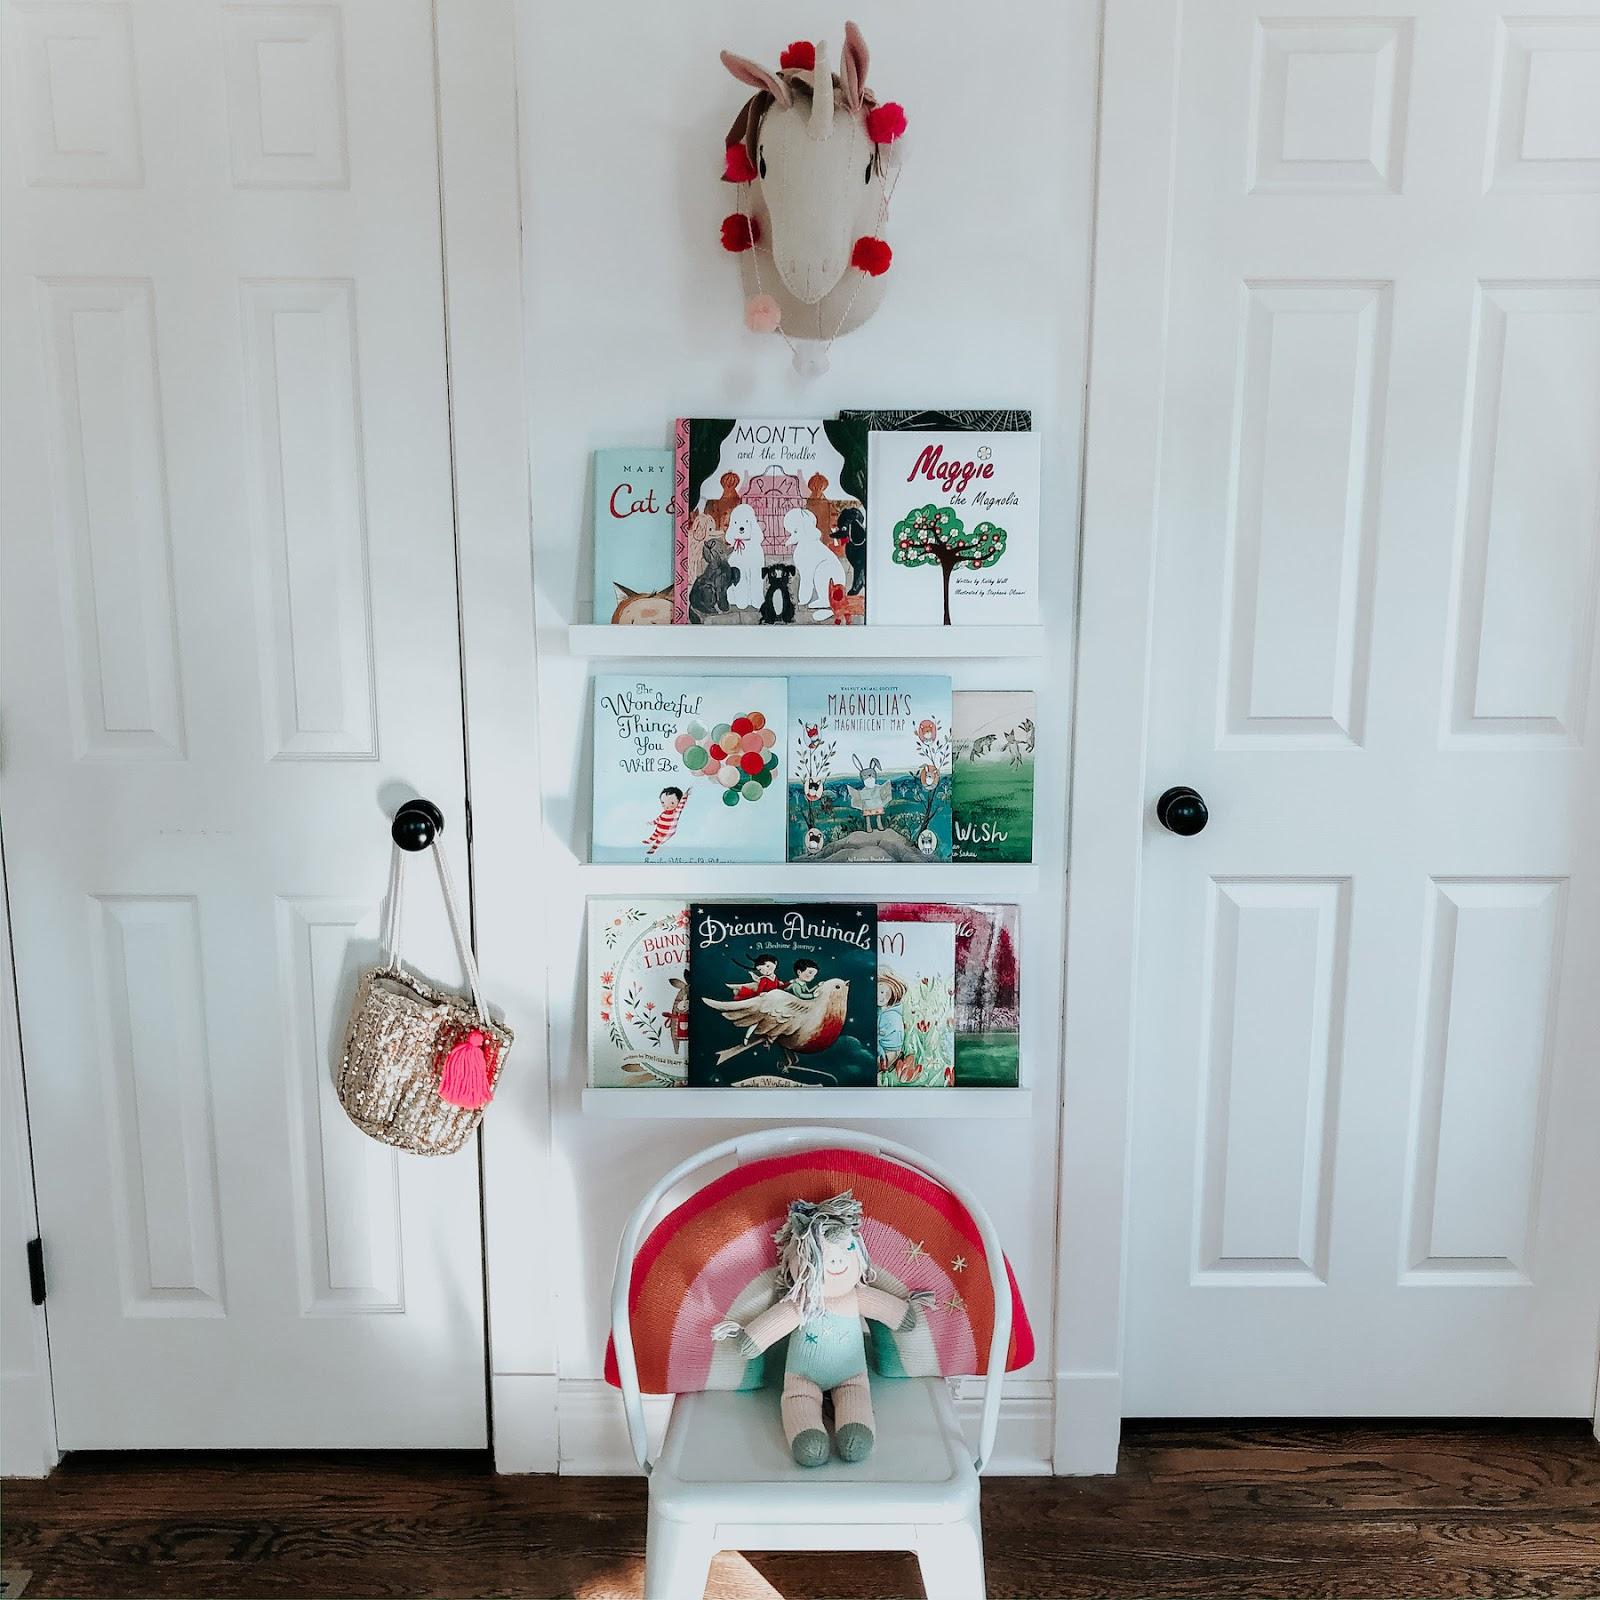 Magnolia's Playroom & Our Current Favorite Books